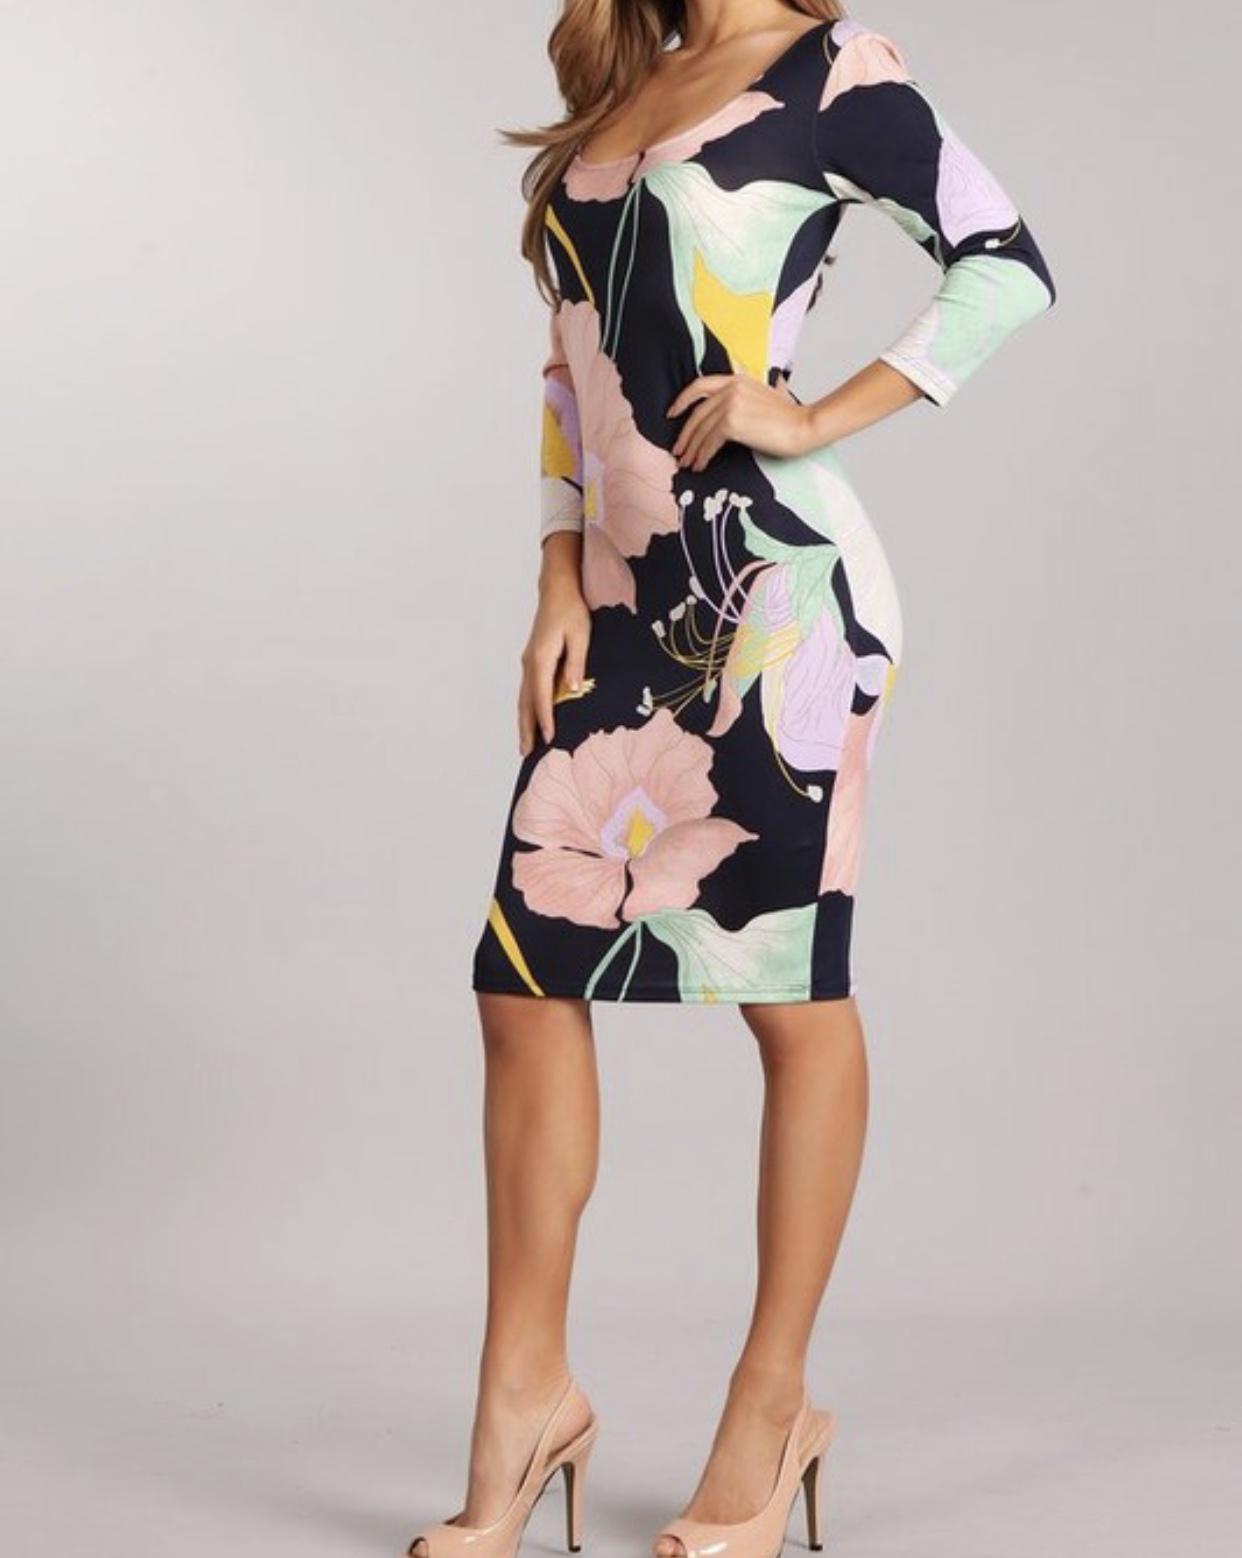 Blush & Blossom Dress